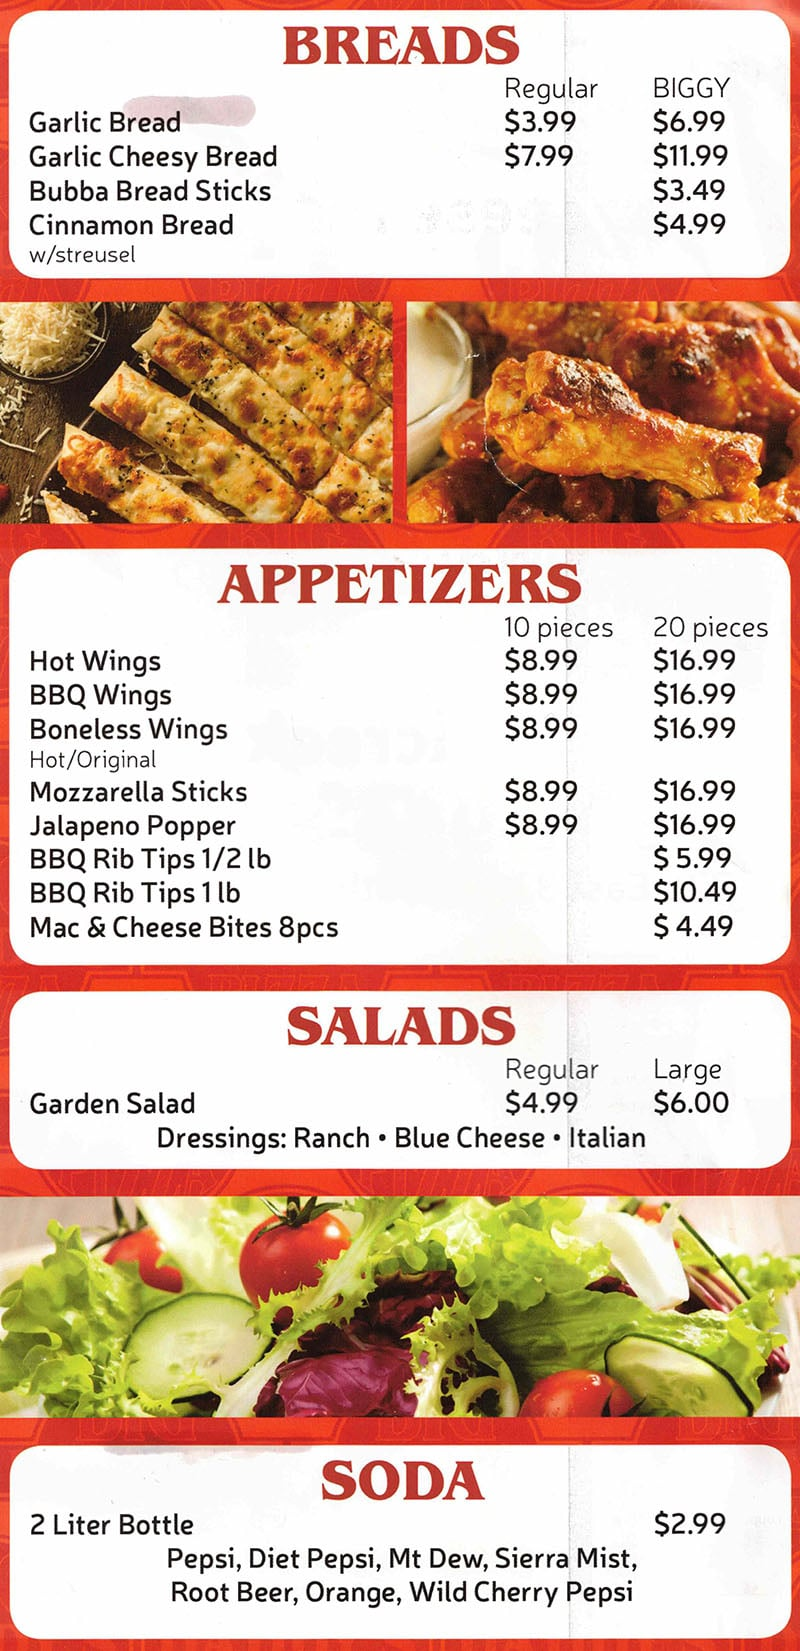 Big Daddy's Pizza menu - breads, appetizers, salads, soda